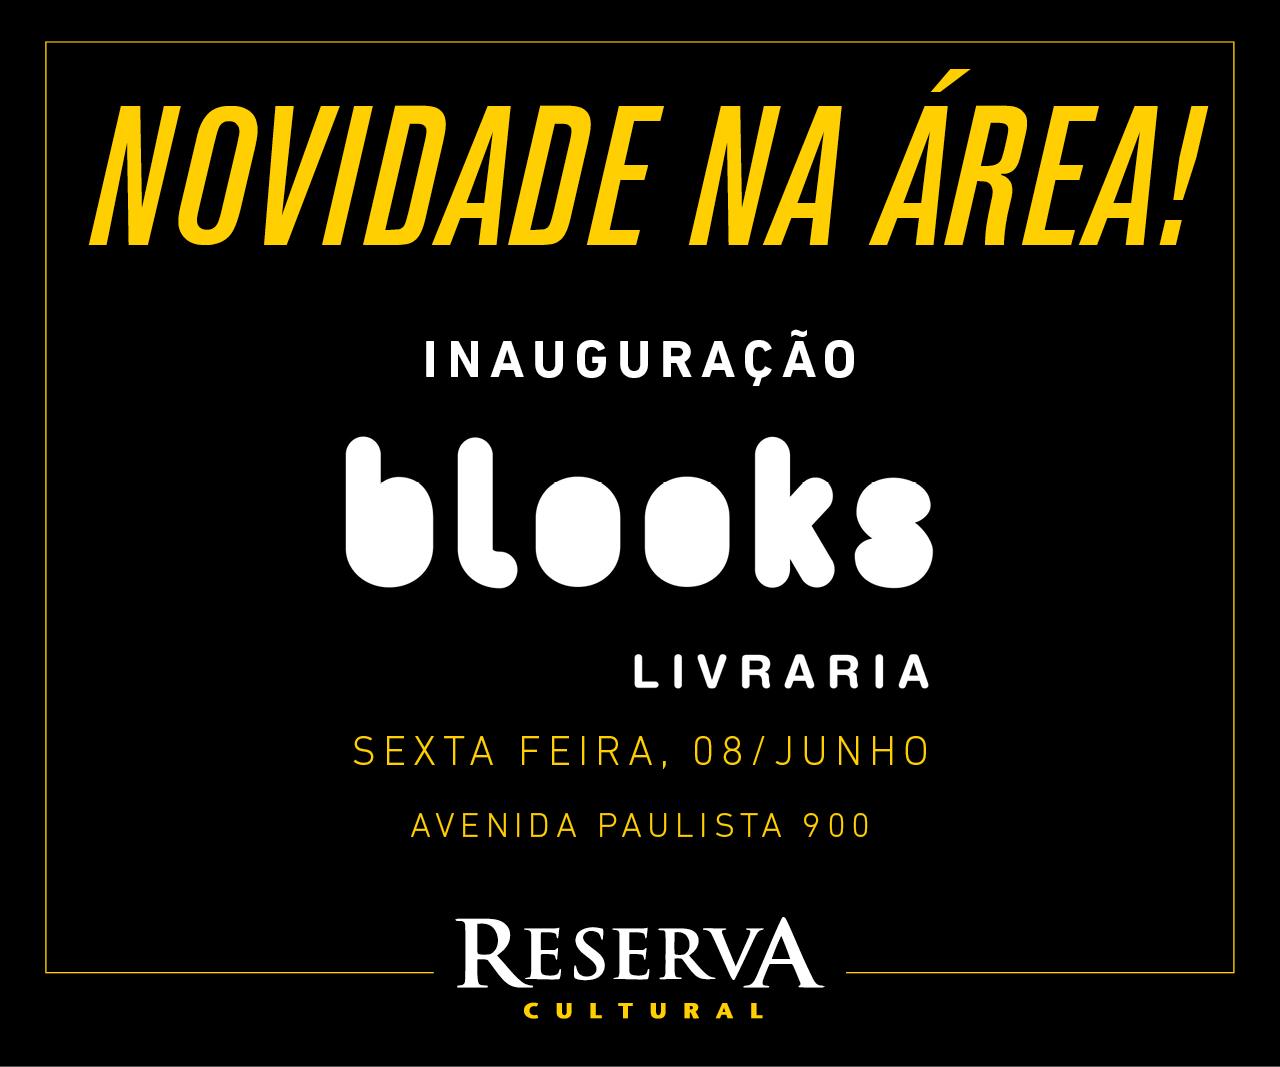 Arte_Blooks_Inauguracao (003)